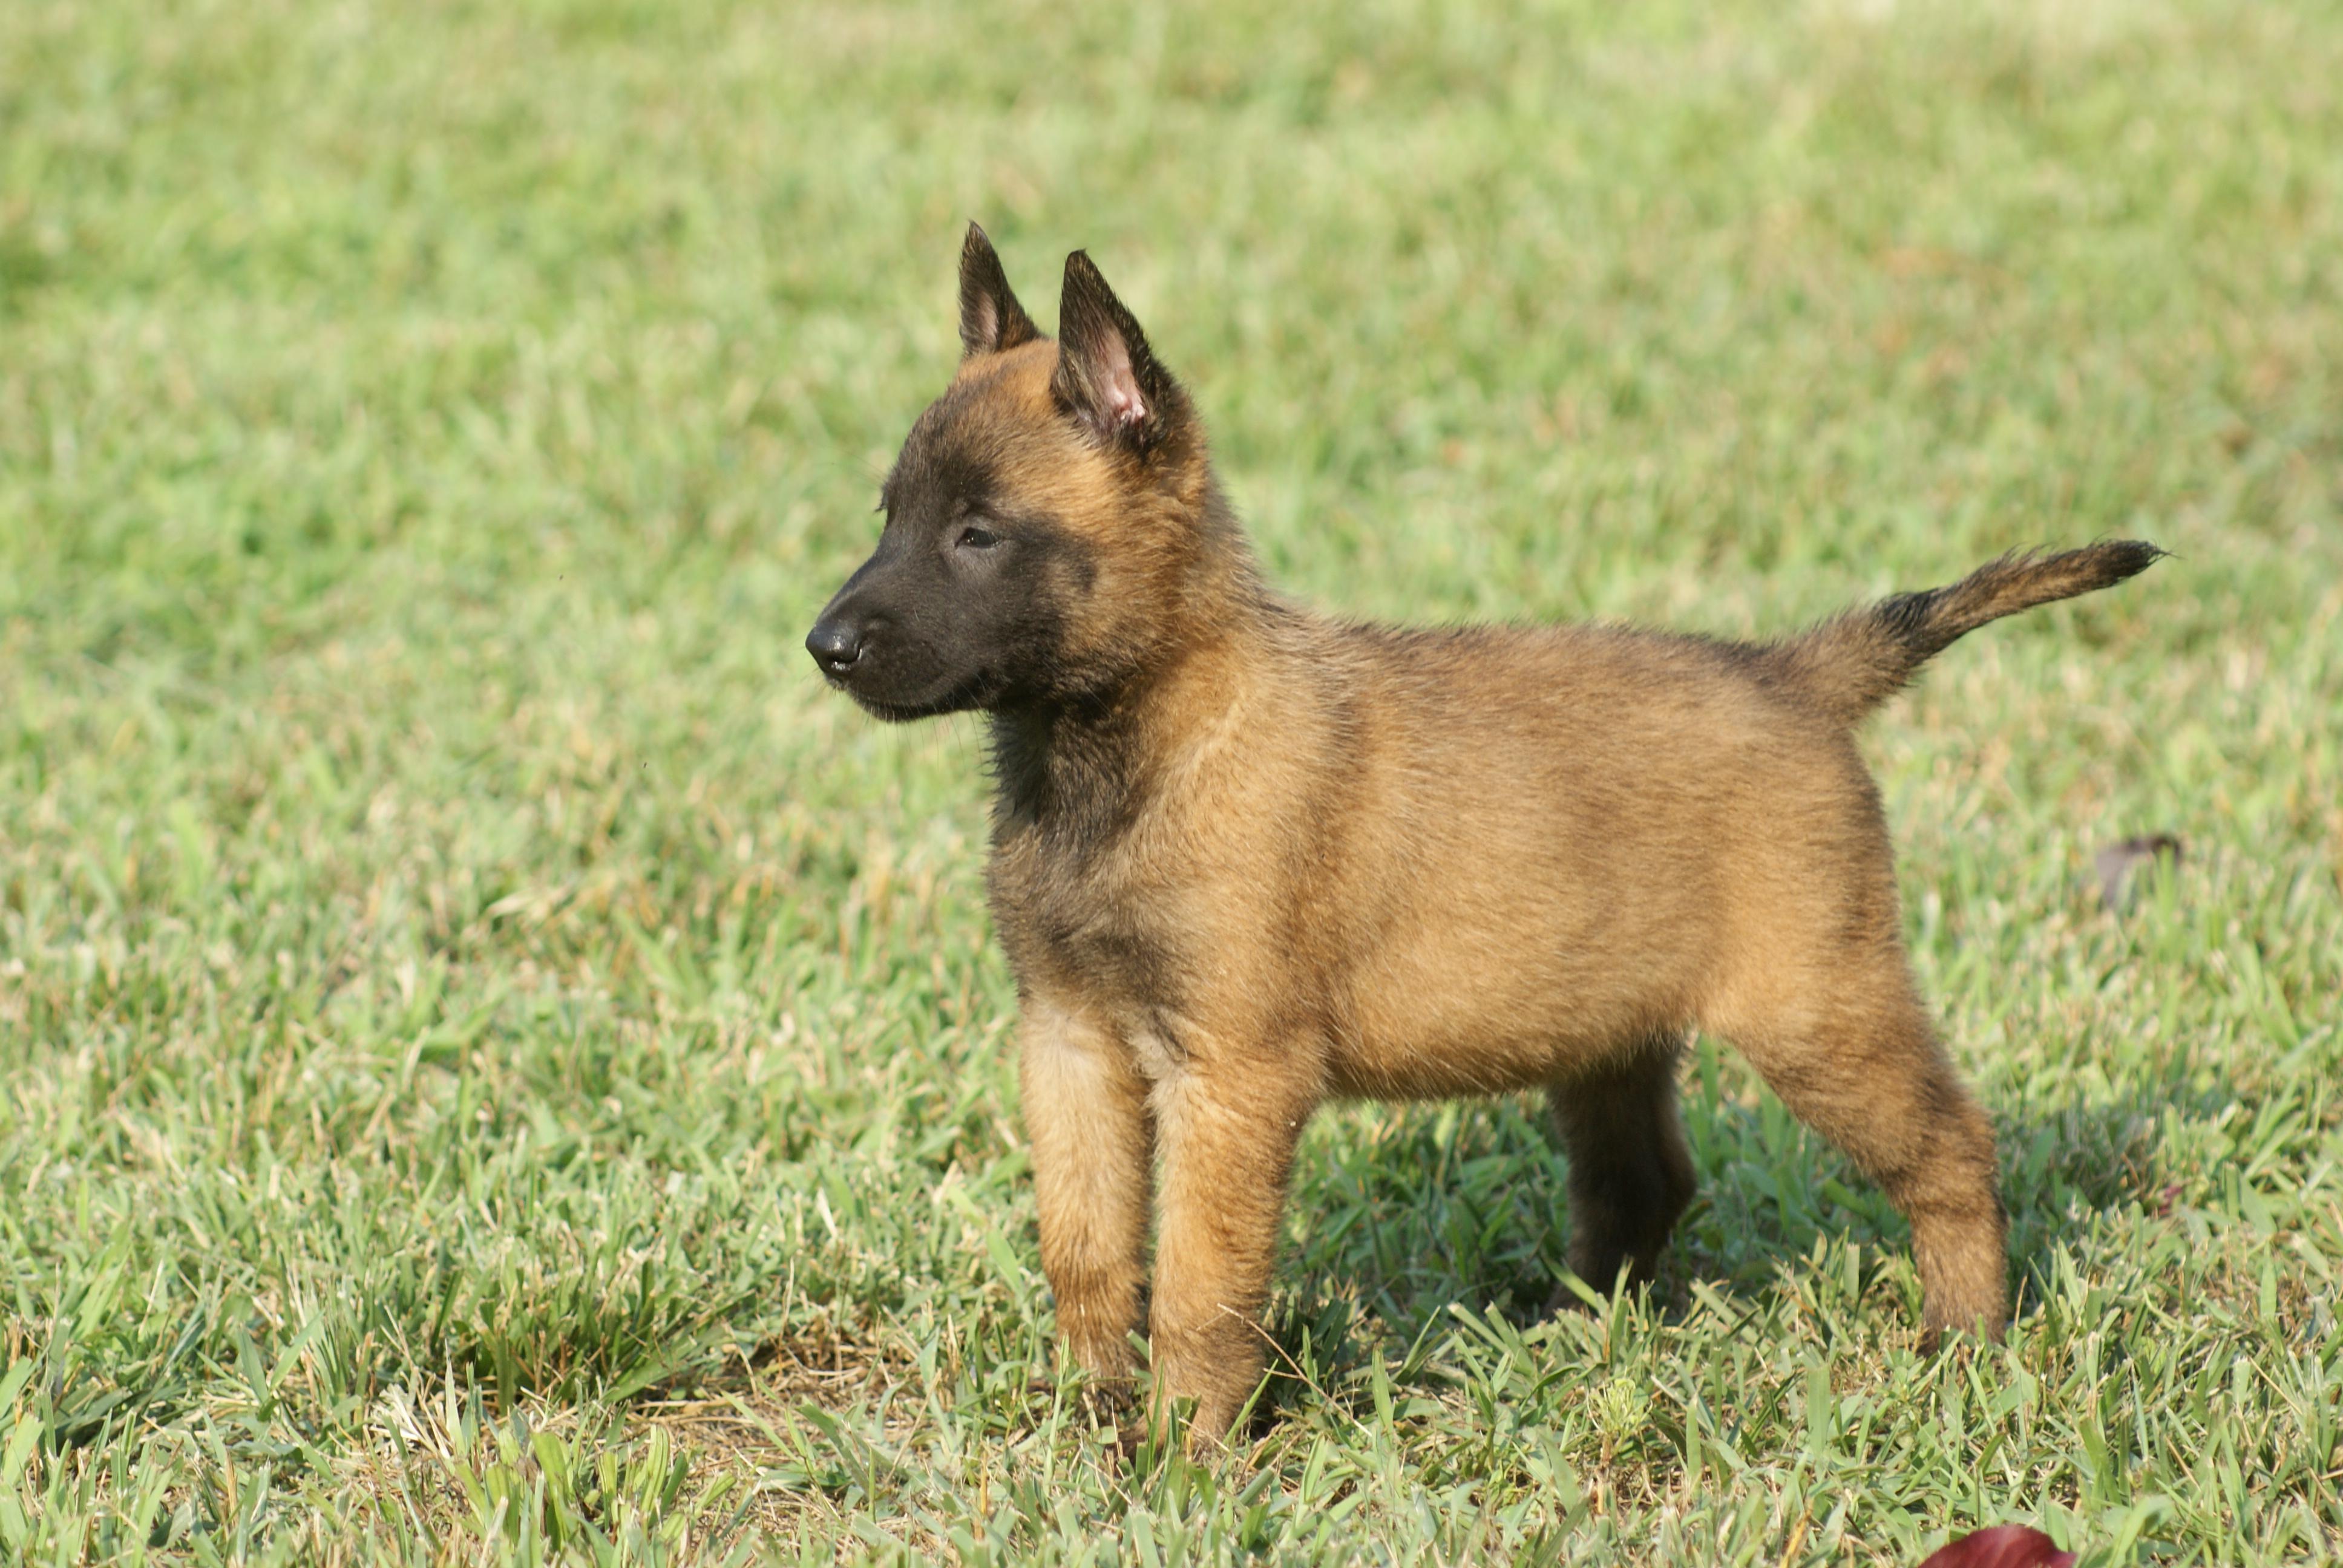 Belgian Shepherd (Malinois) Puppies: Belgian Puppies Breed